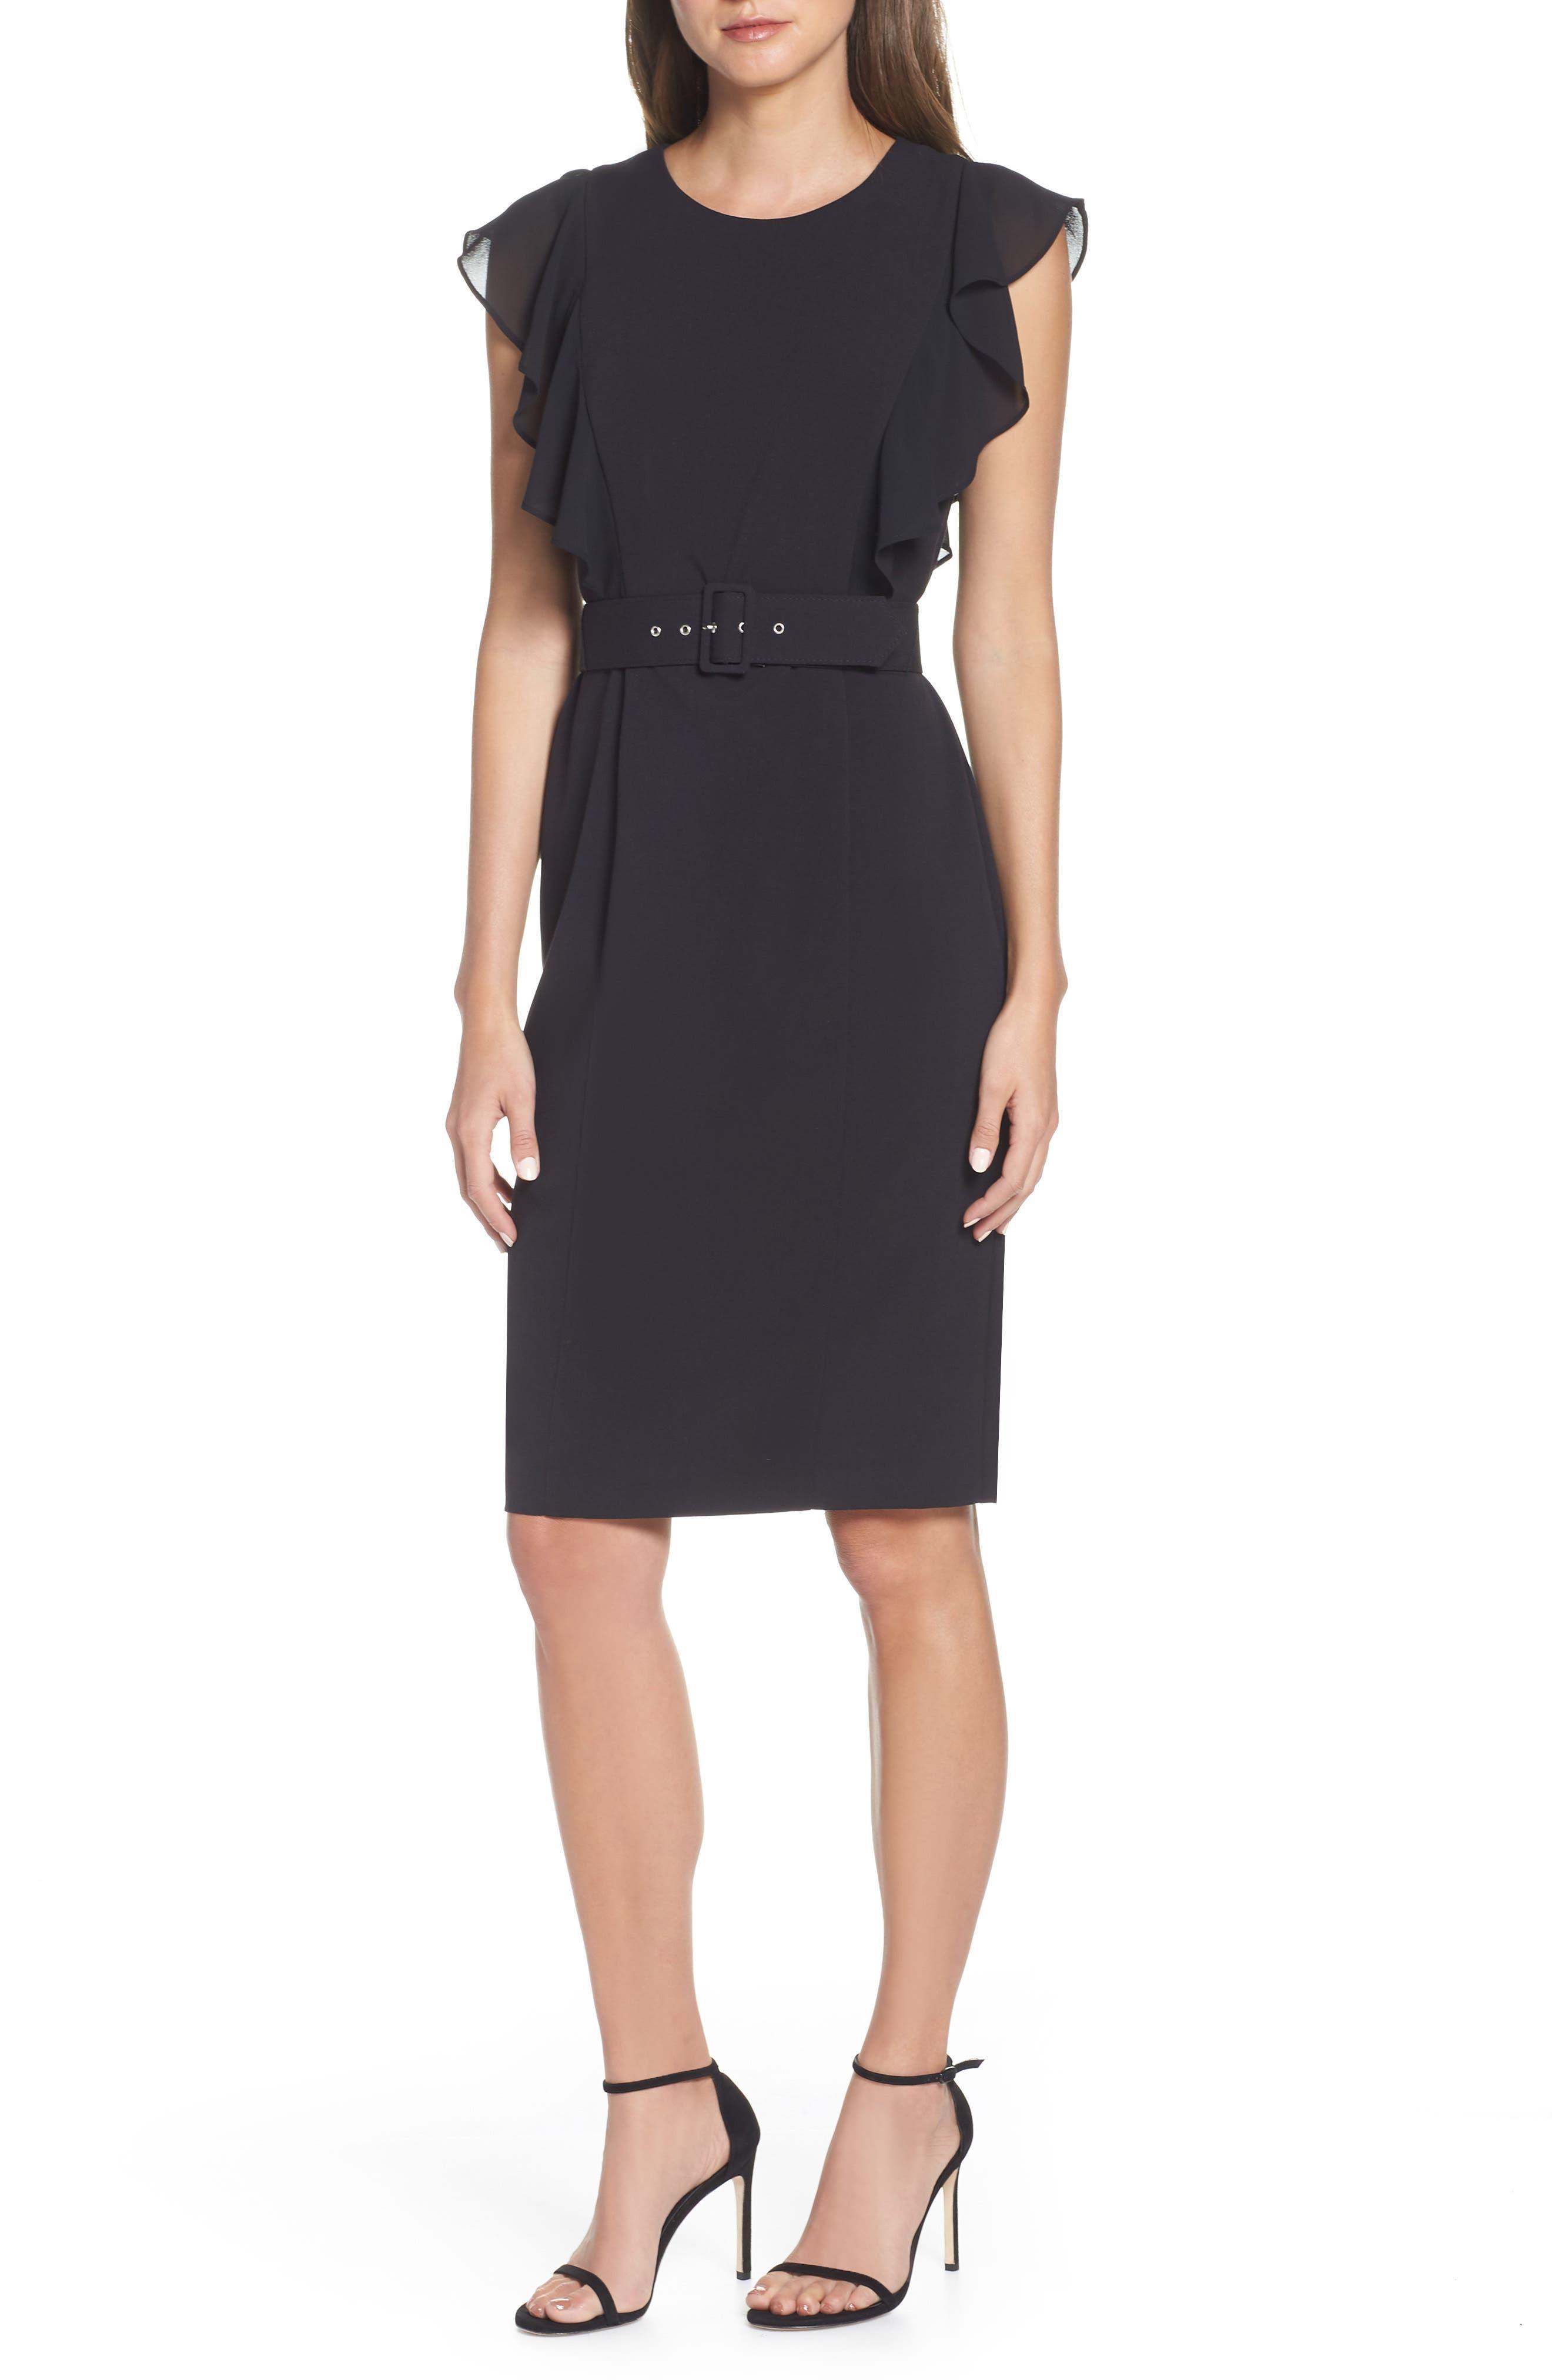 HARPER ROSE,                             Belted Sheath Dress,                             Main thumbnail 1, color,                             BLACK